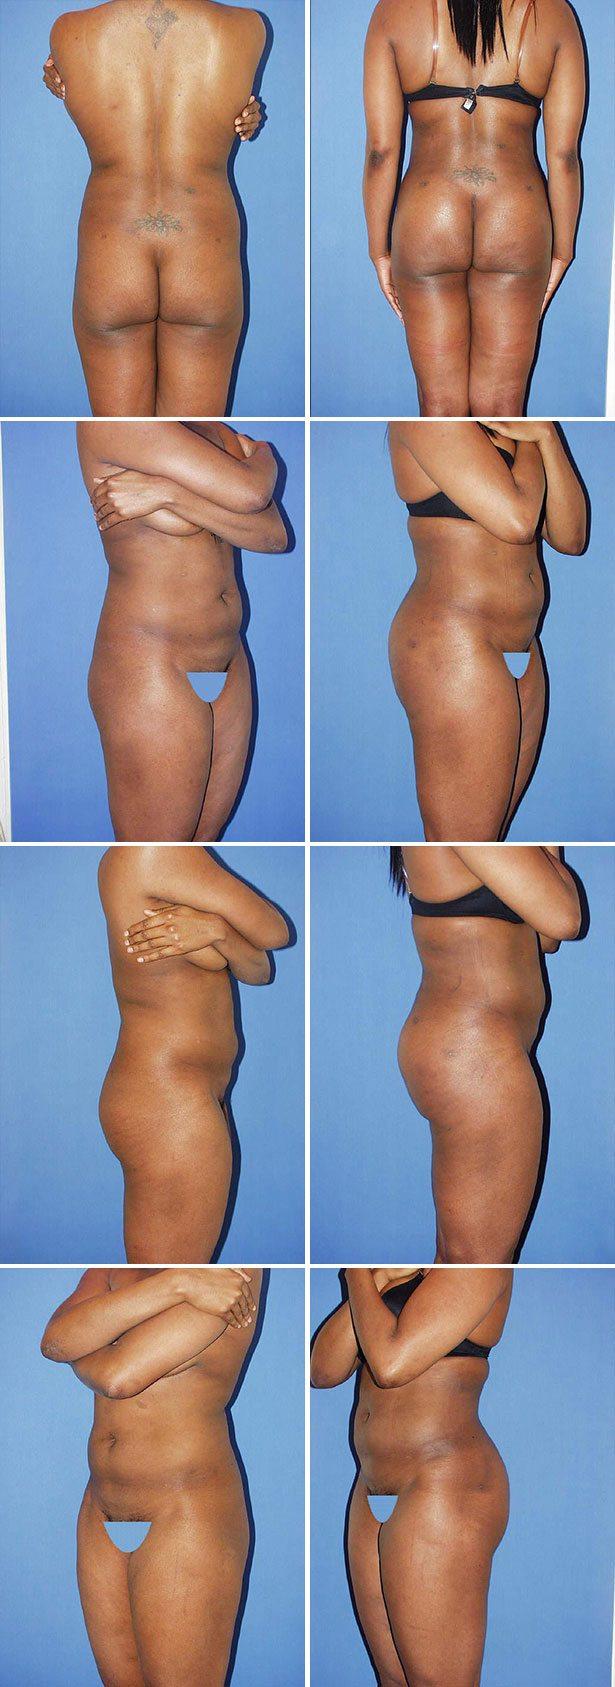 Butt Implants Before & After Photos - Miami - Dr. Gershenbaum